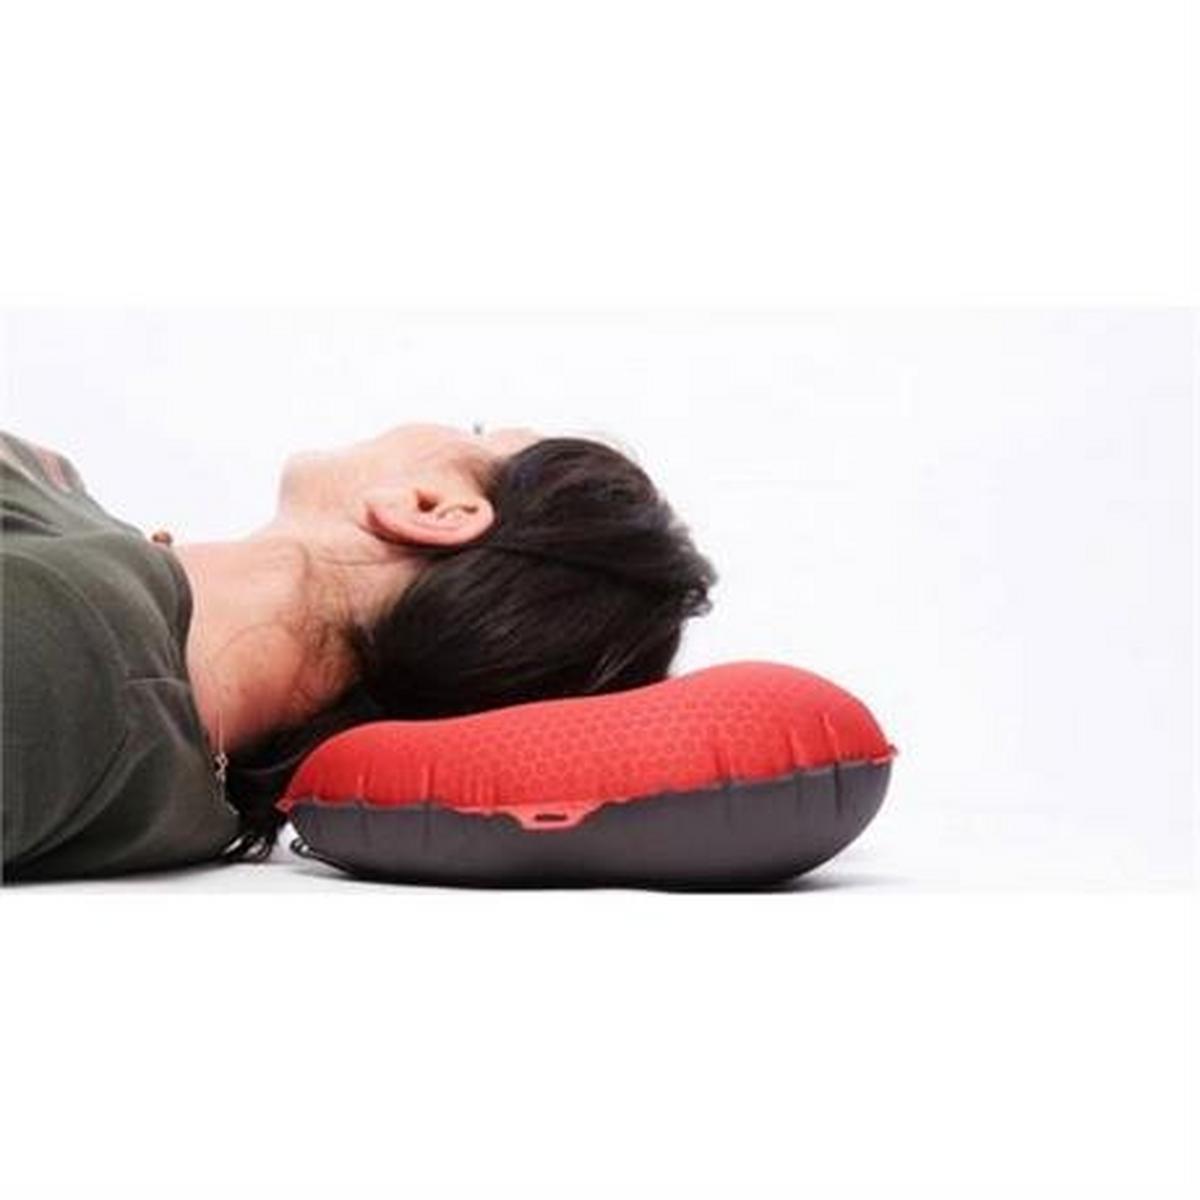 Exped Camping Pillow Air (Medium) - Red